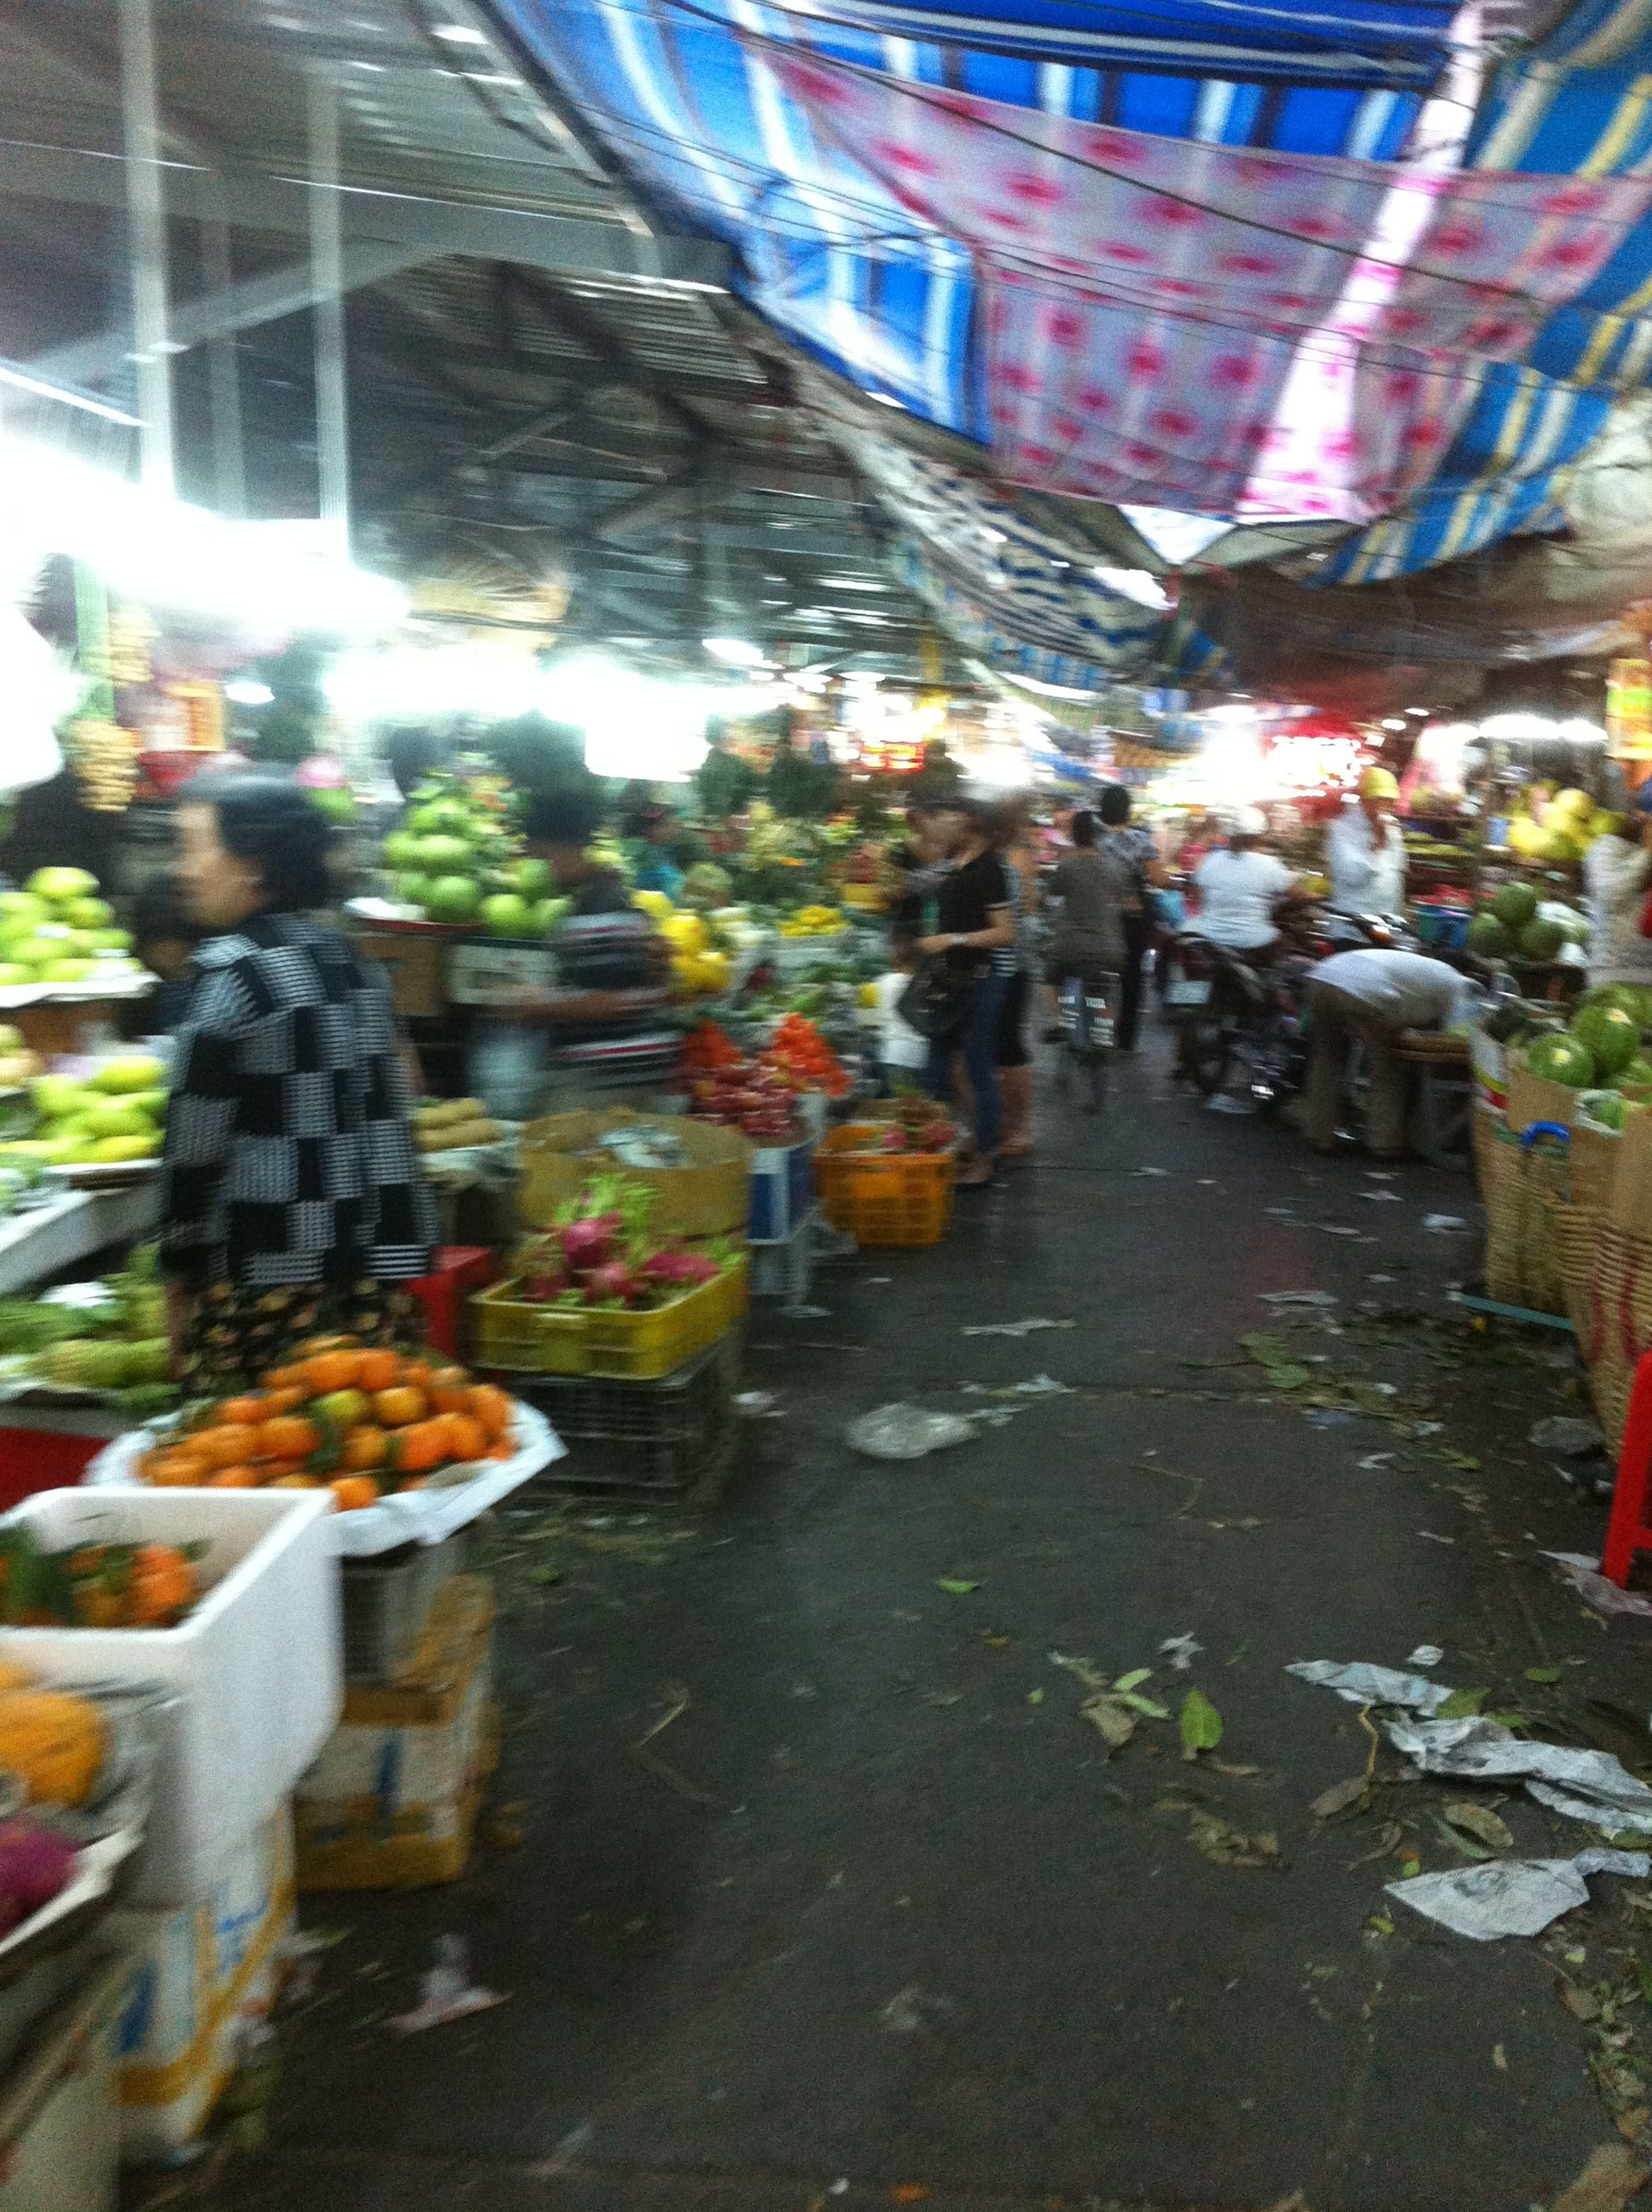 Tet, Vietnam (Ba Chieu market) 2014